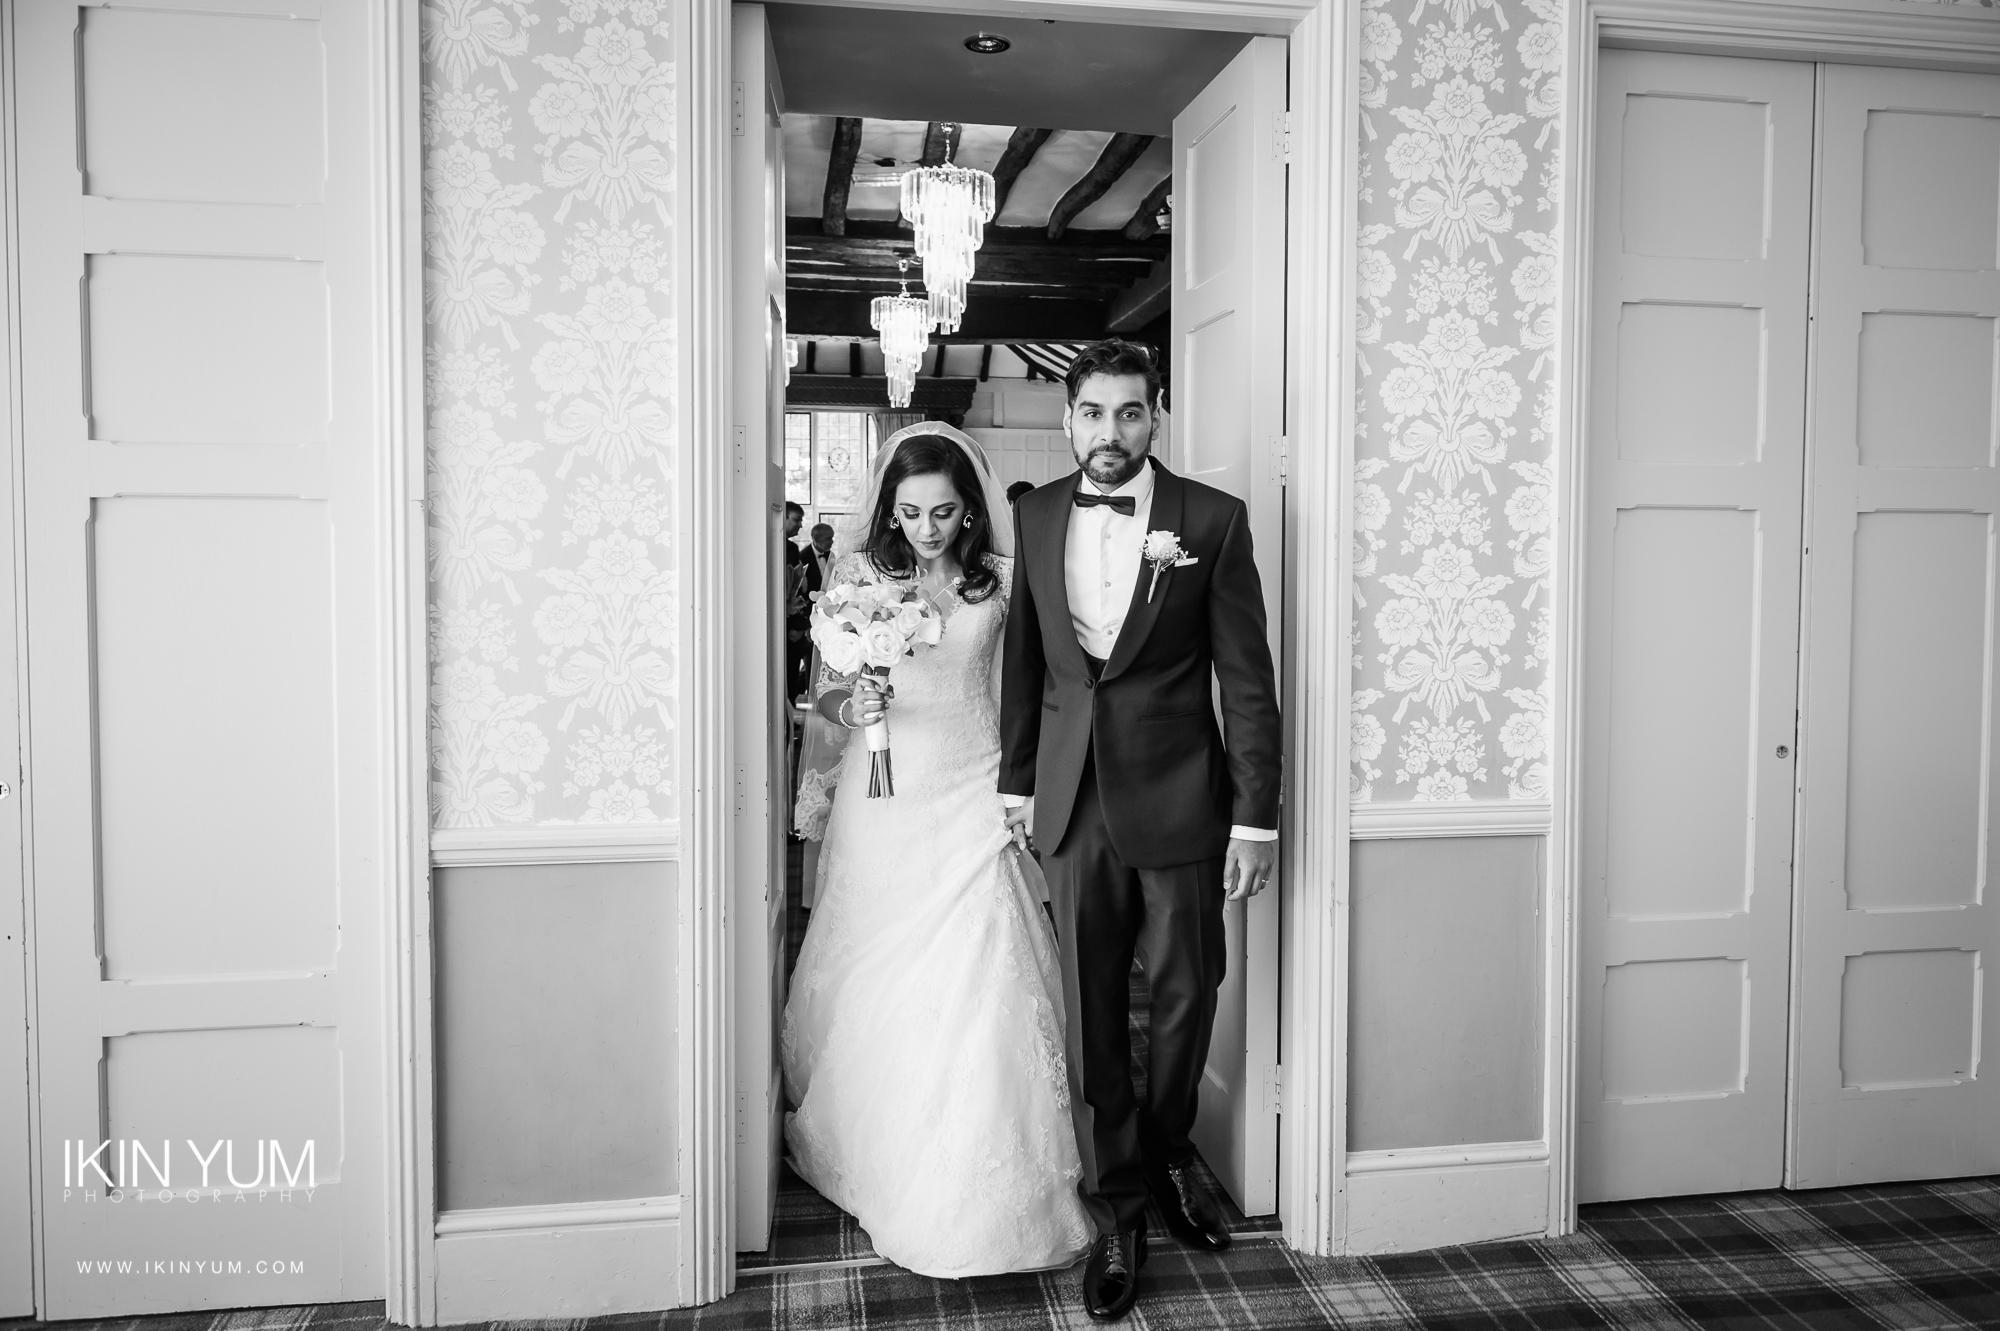 Laura Ashley Manor Wedding - Ikin Yum Photography-073.jpg